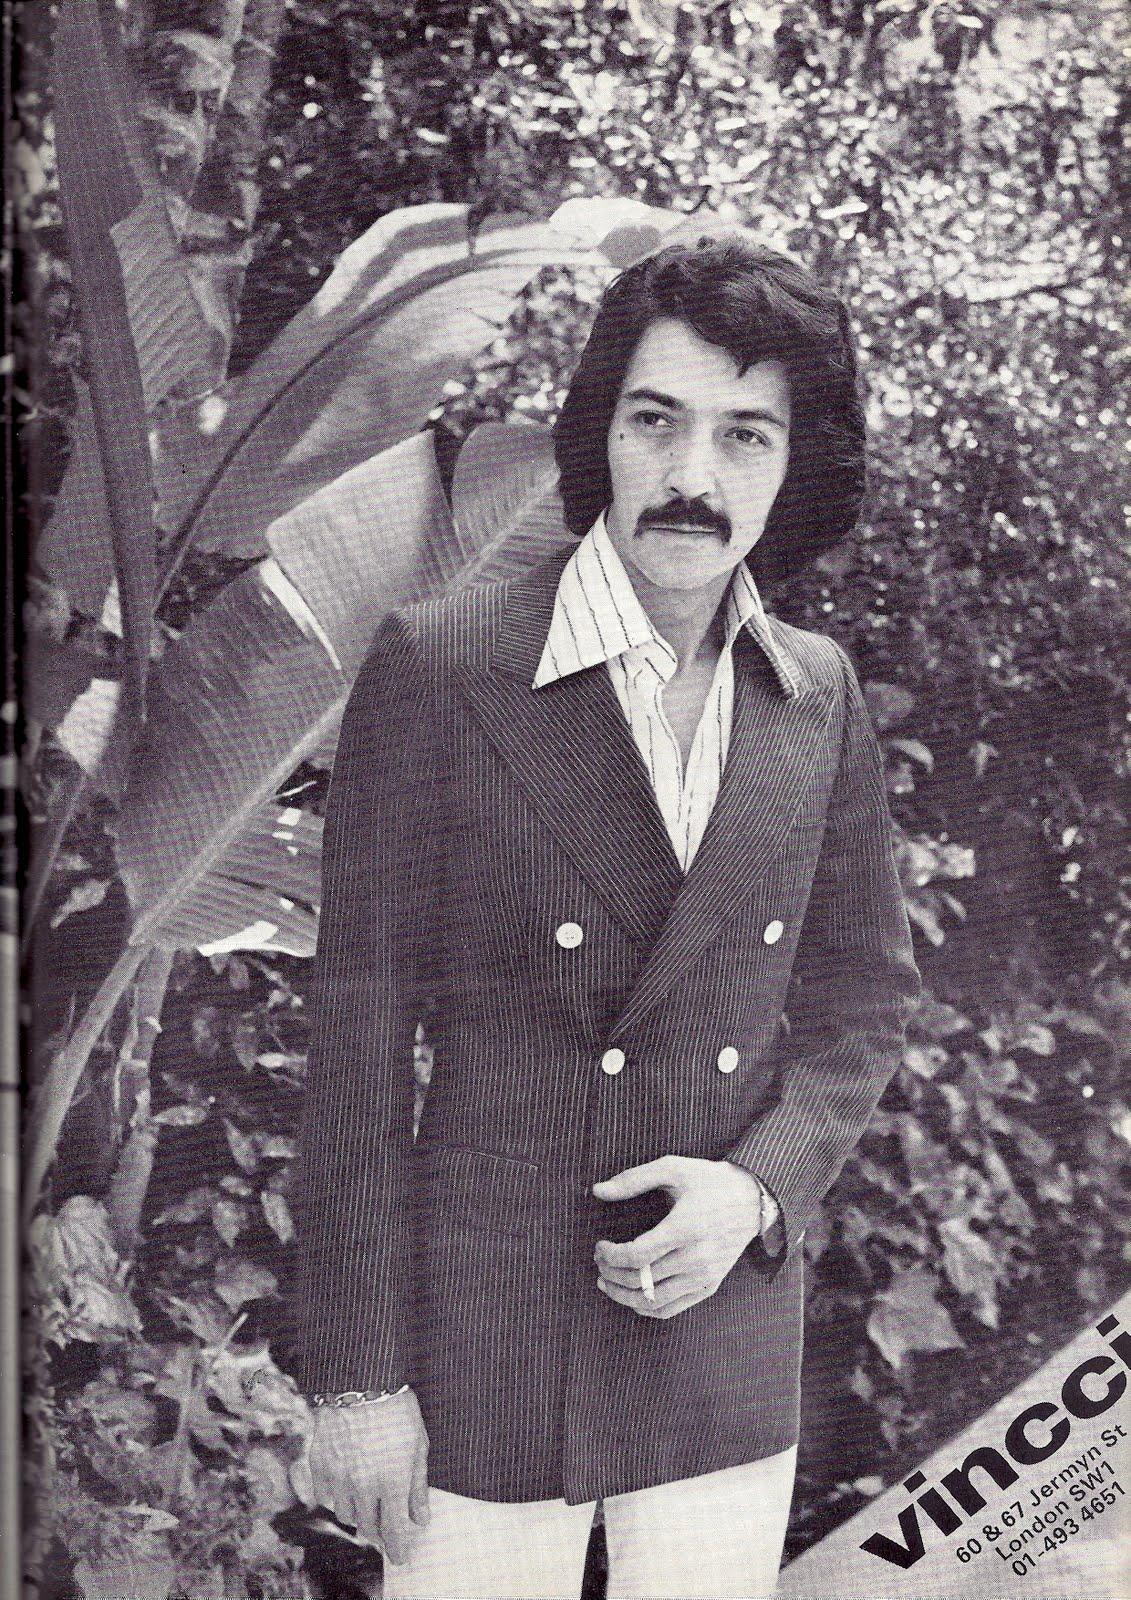 1970 Mens Clothes Google Search: Fashion Preserve: Let's Do The Time Warp: 1970s British Vogue